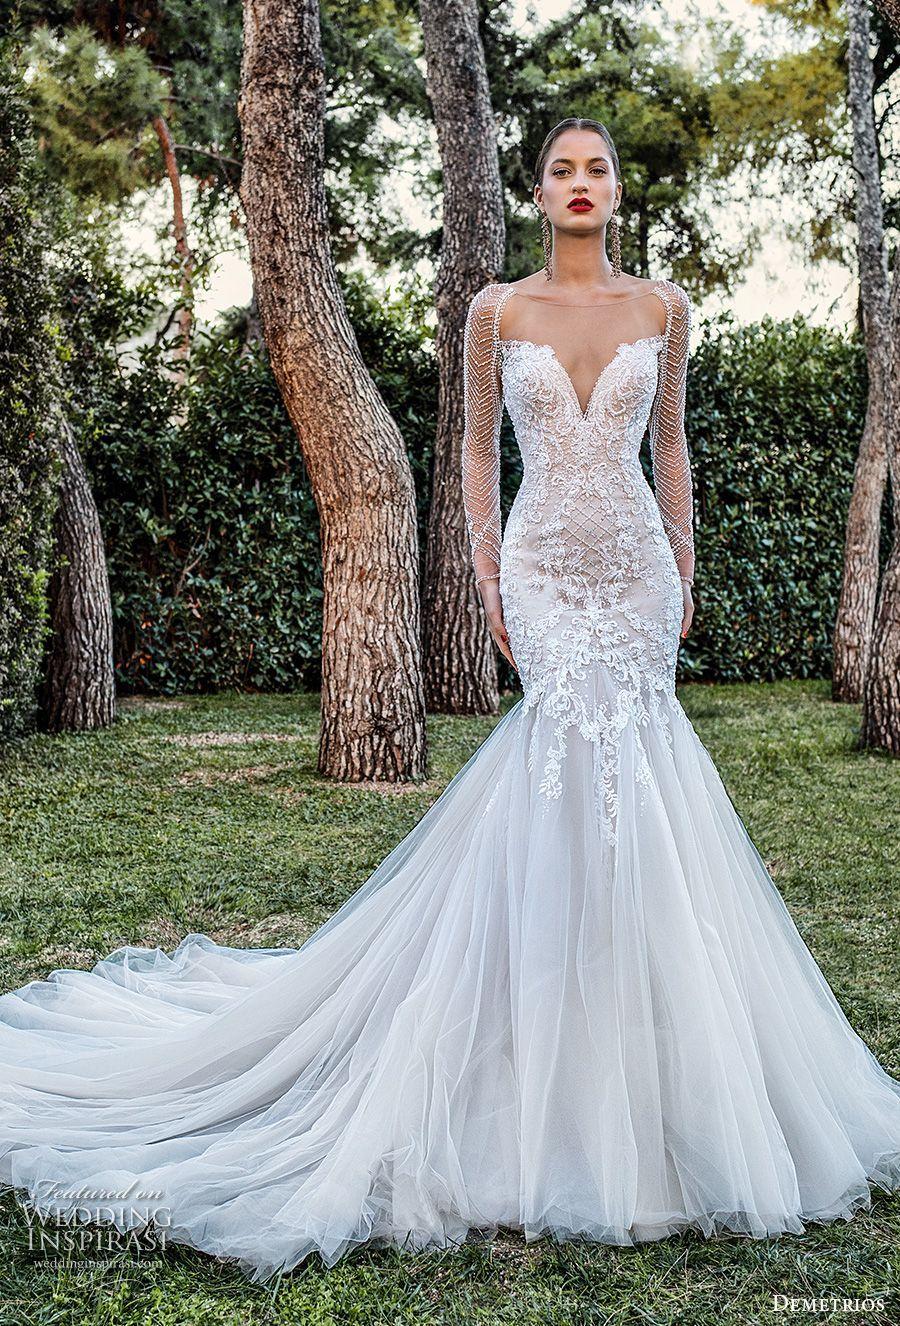 Demetrios 2020 Bridal Long Sleeves Illusion Bateau Sweetheart Neckline Heavily Embellished Bodice Wedding Dress Long Sleeve Wedding Dresses Sheer Wedding Dress [ 1326 x 900 Pixel ]